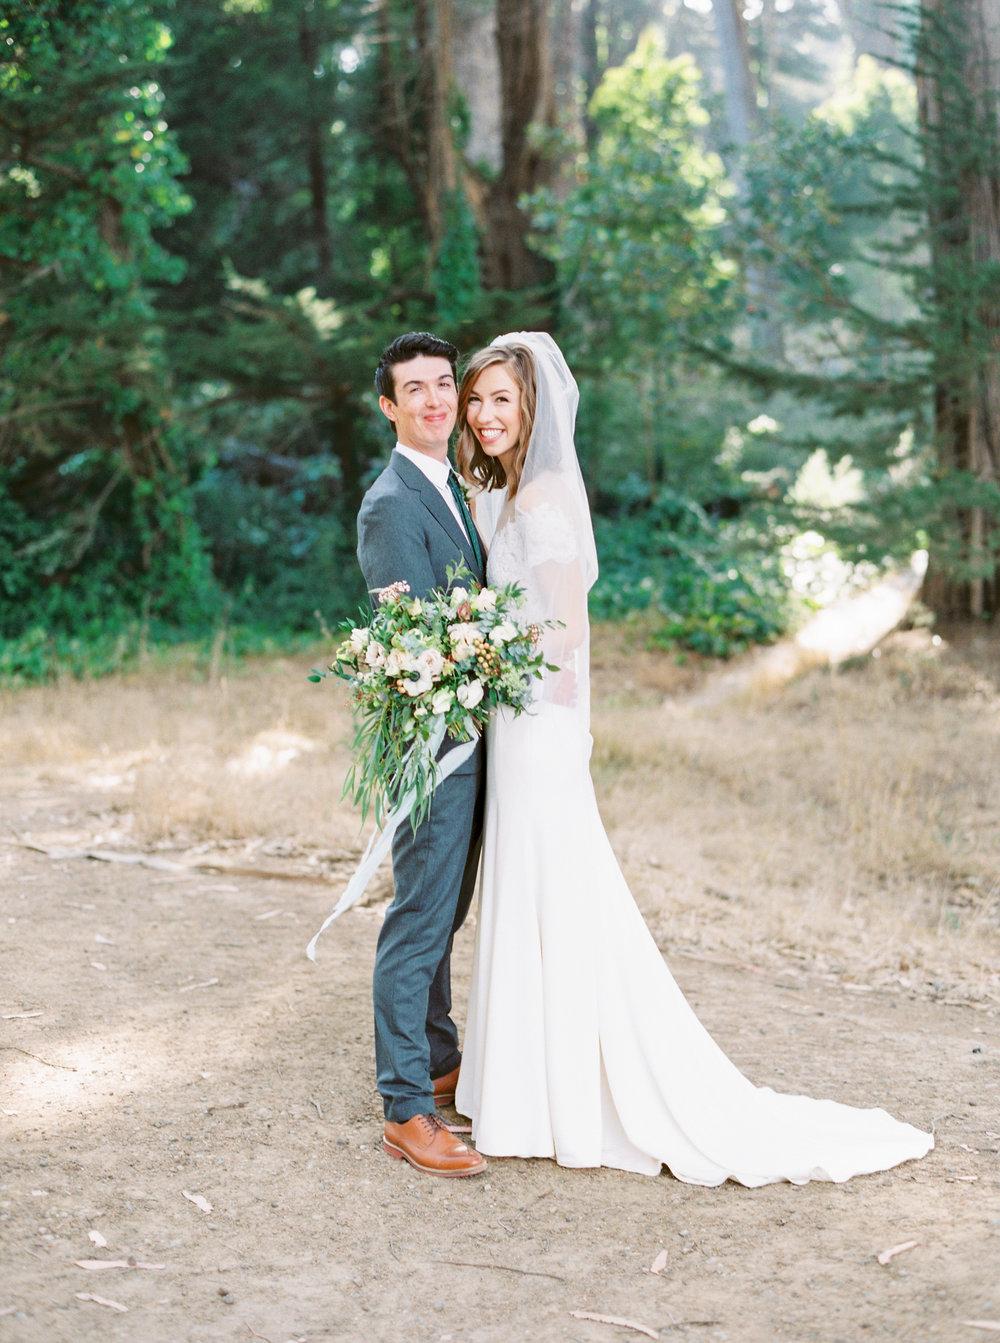 Log-cabin-wedding-in-presidio-san-francisco-california-desintation-wedding-photography-40.jpg